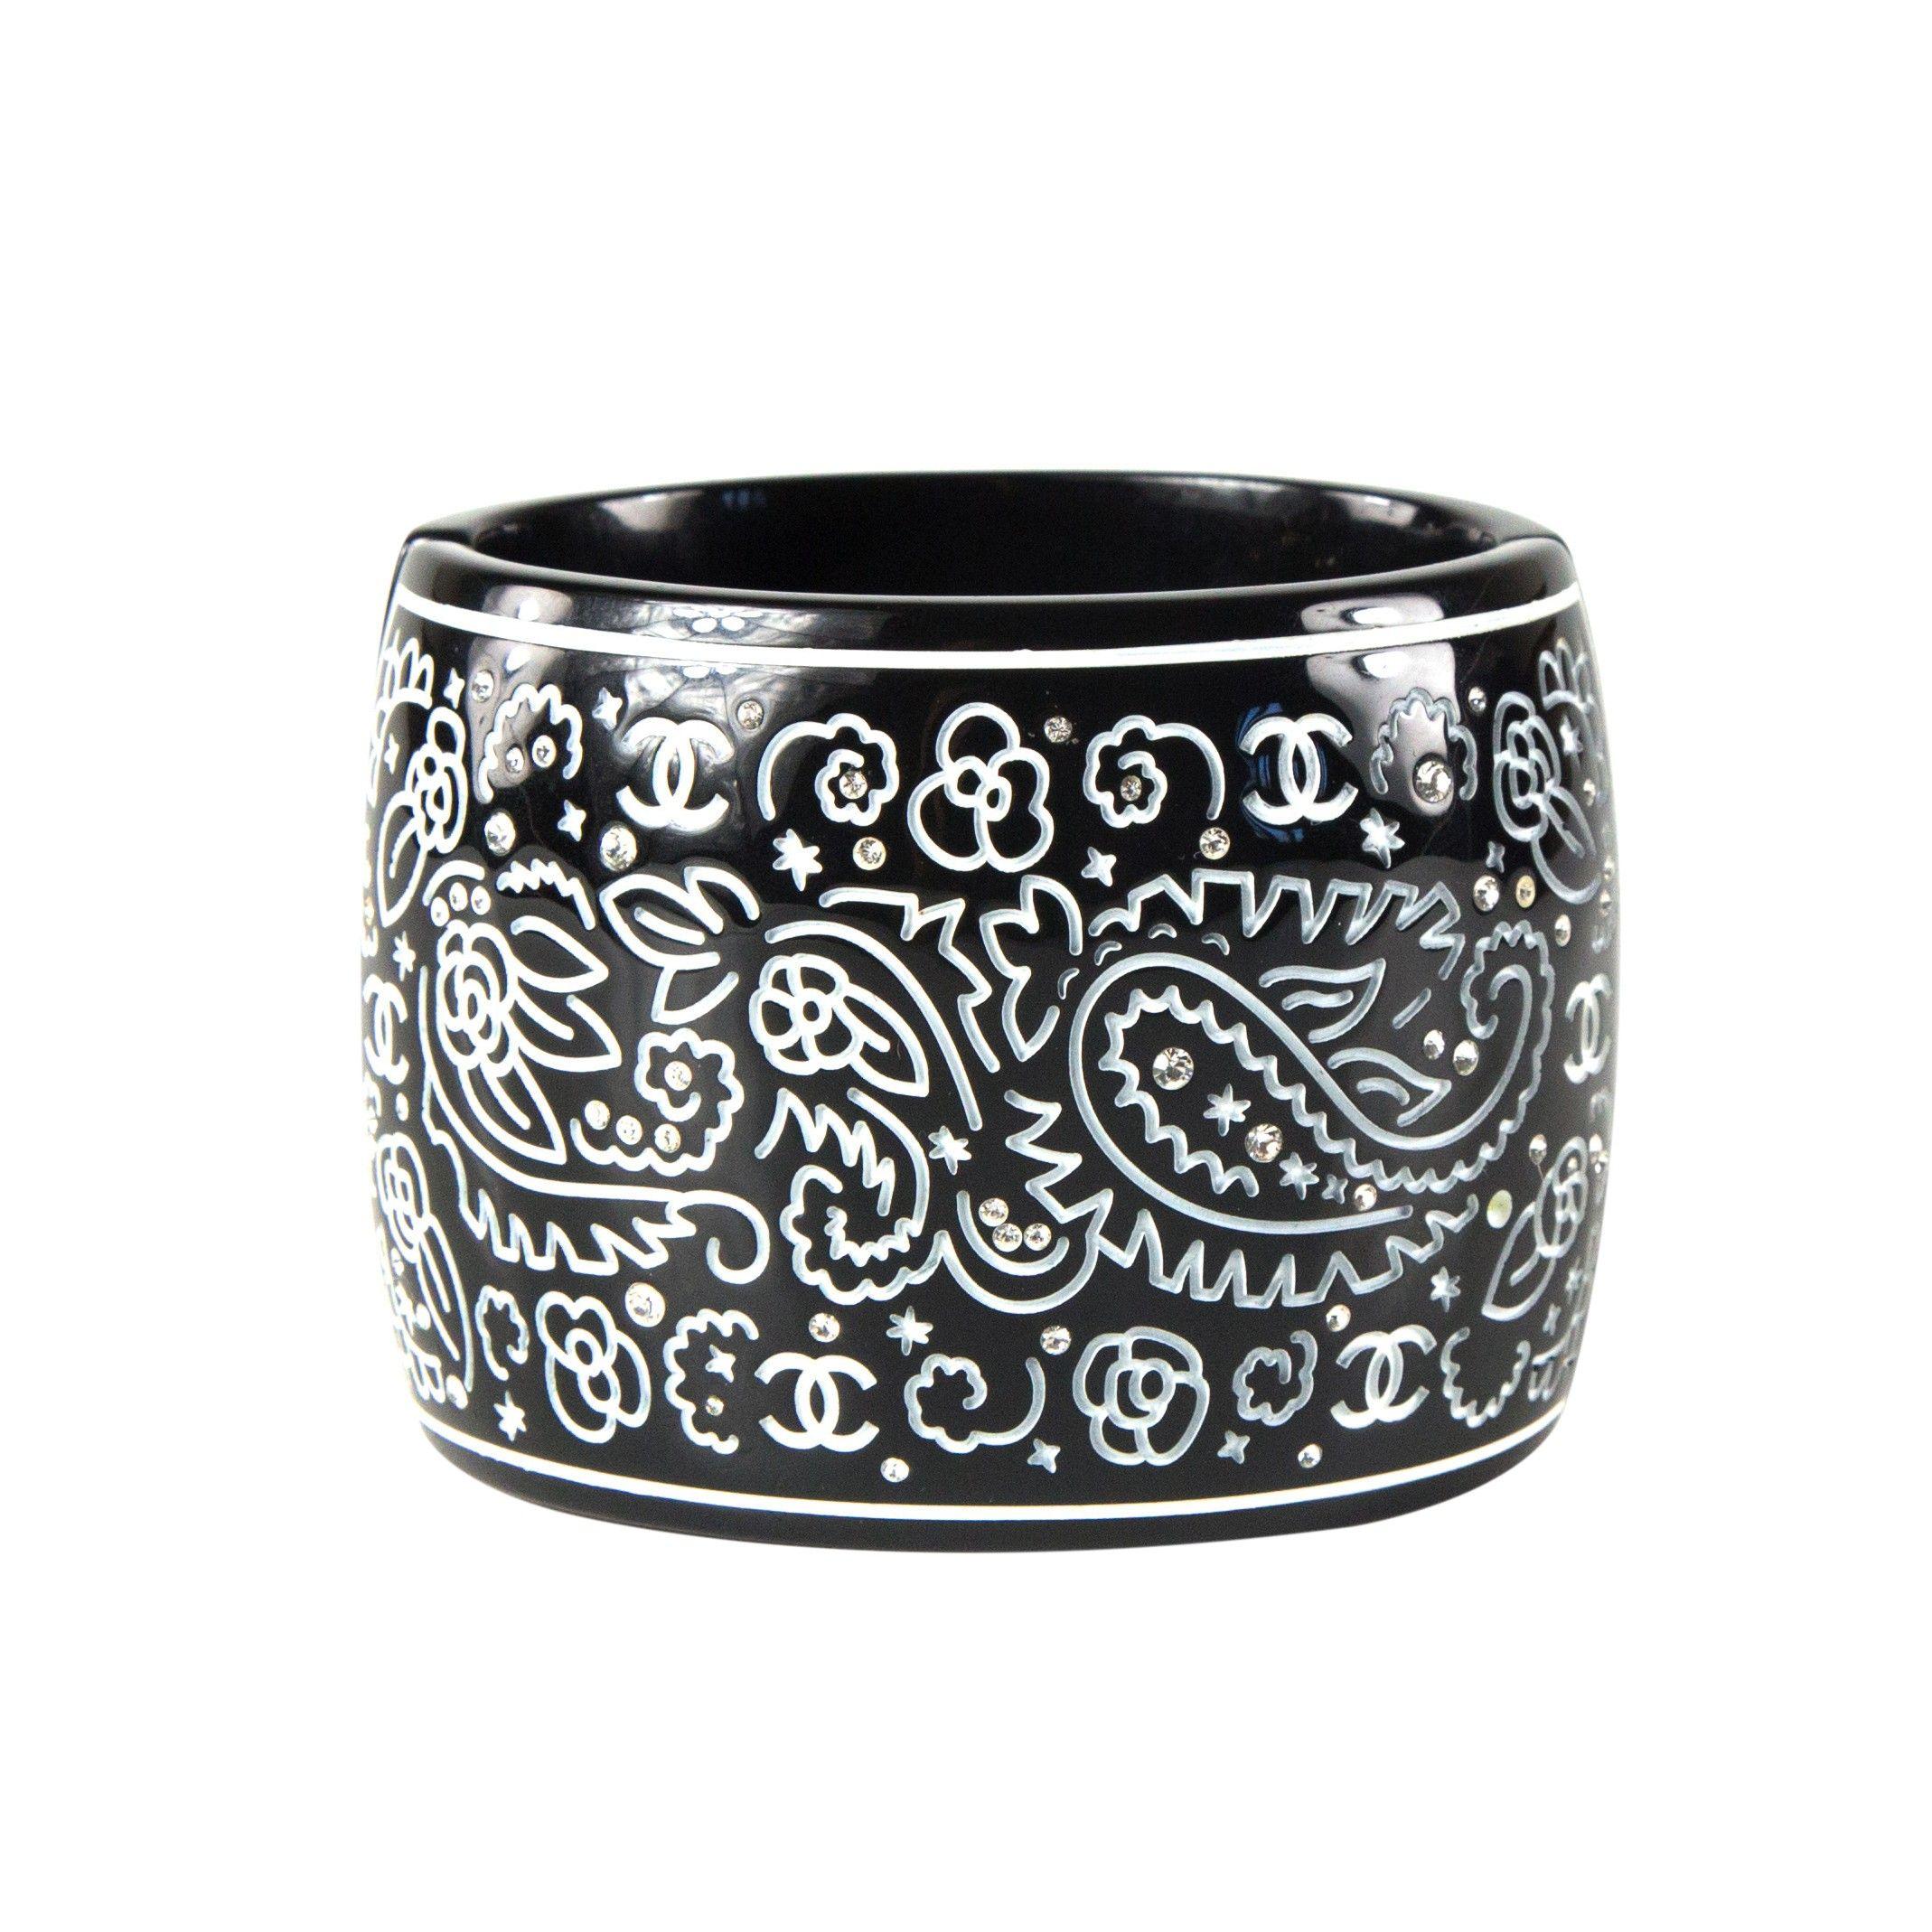 Chanel Crystal Cuff CC Paisley Wide Bracelet - Black & White ...